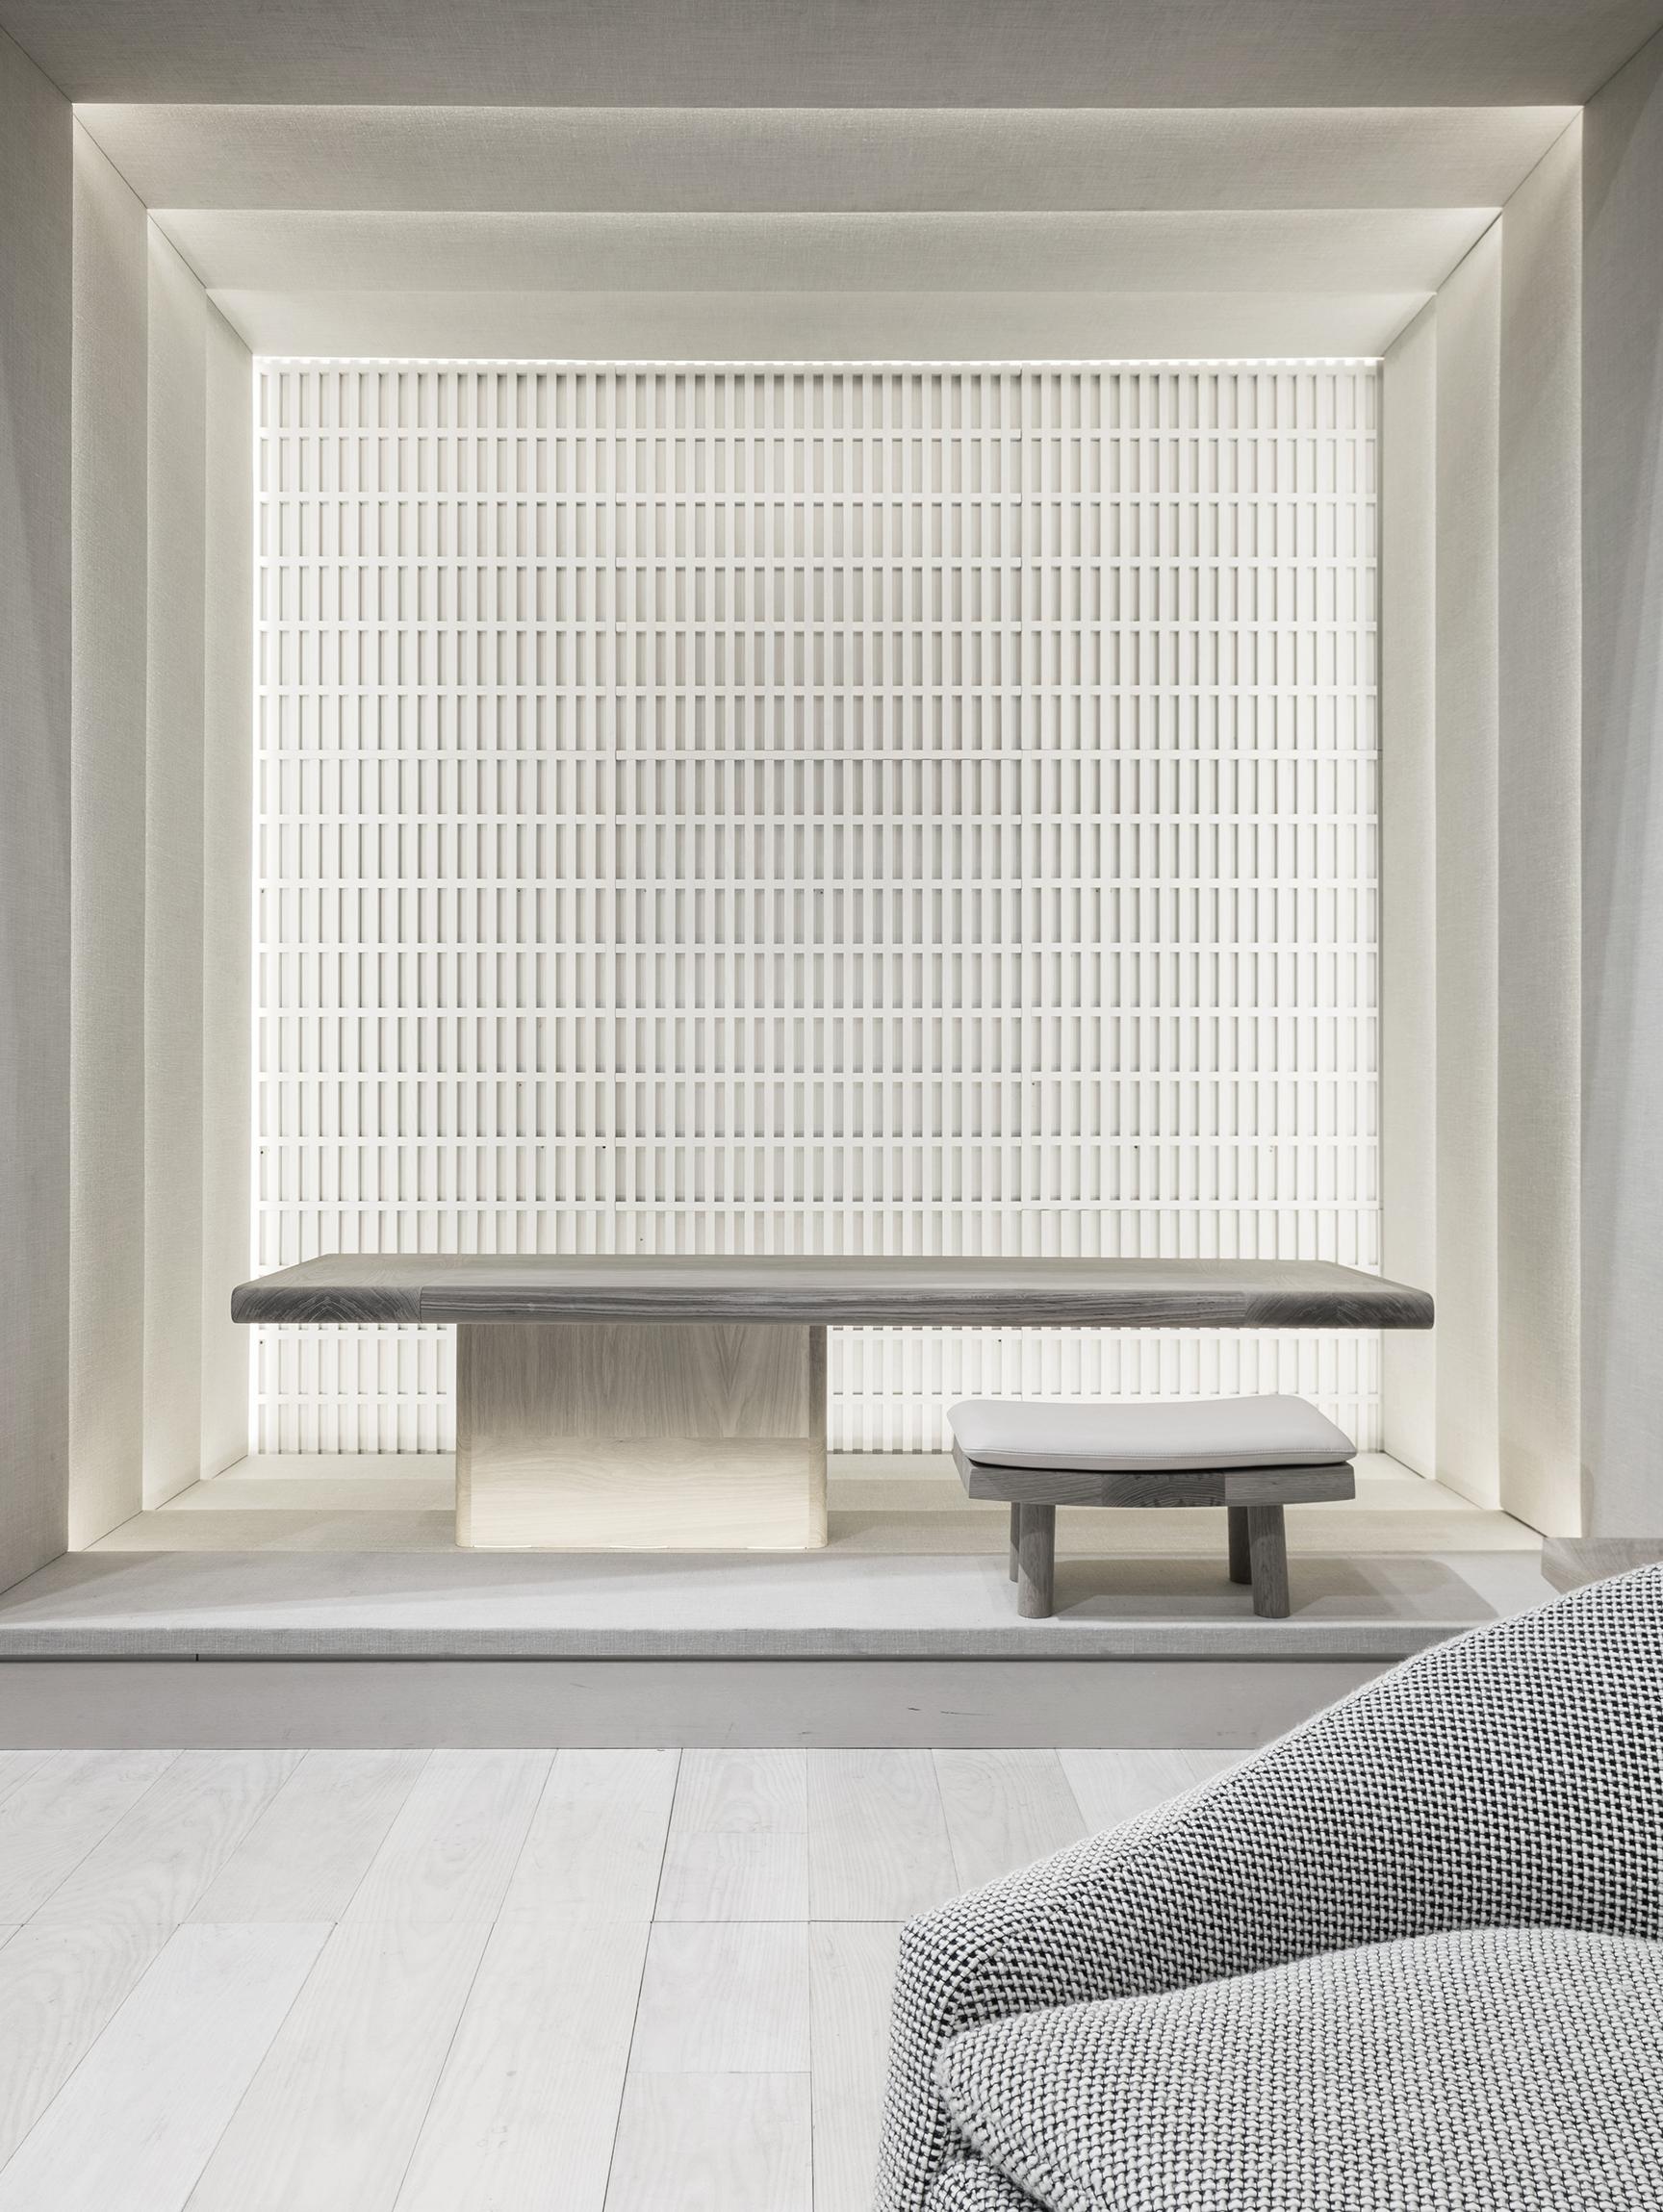 Studio Paolo Ferrari Portfolio